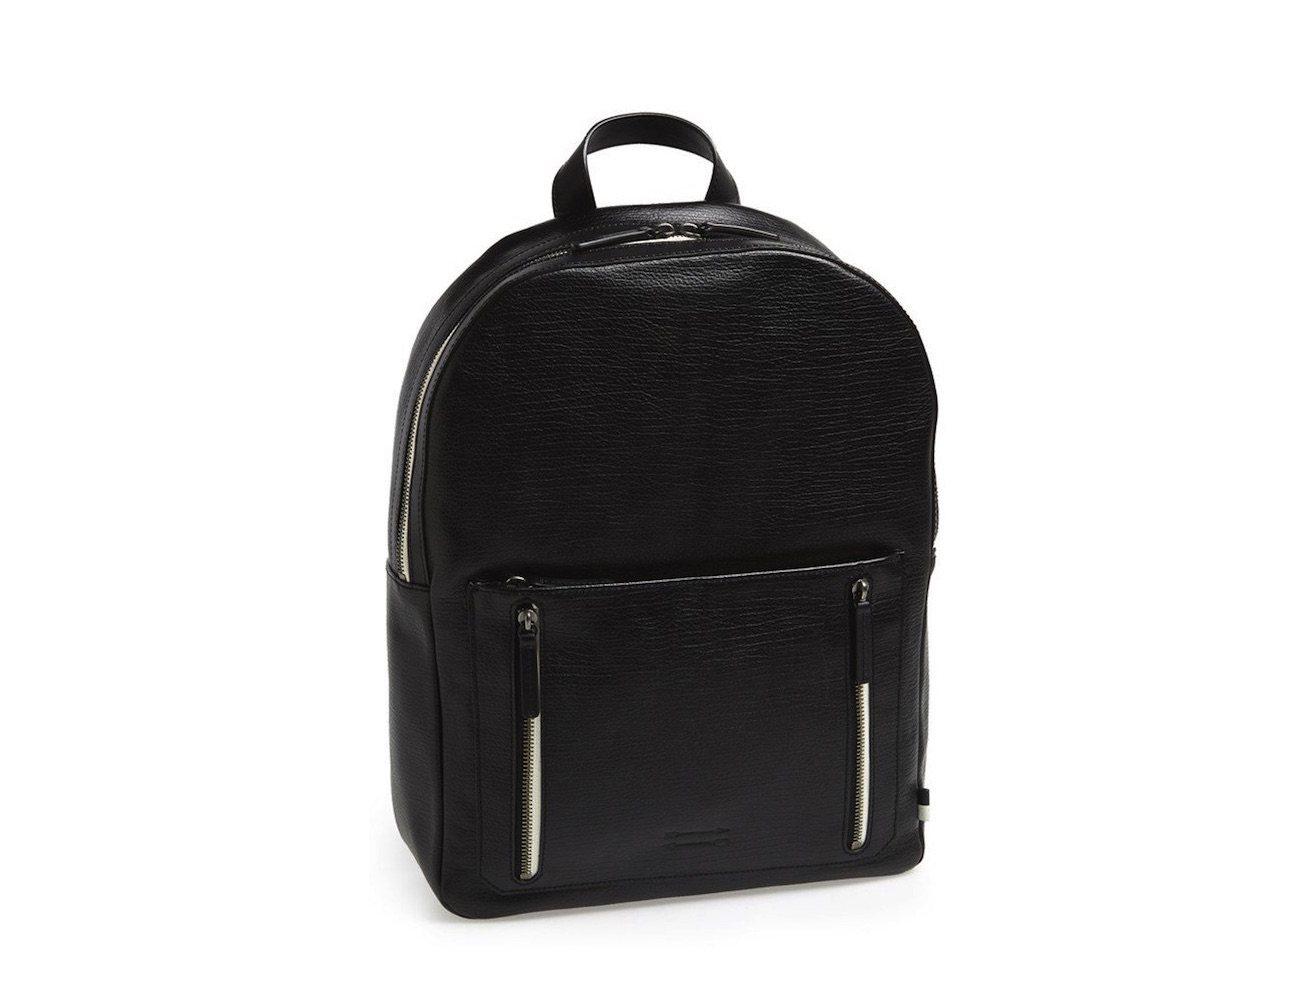 Bondi Leather Backpack by Ben Minkoff